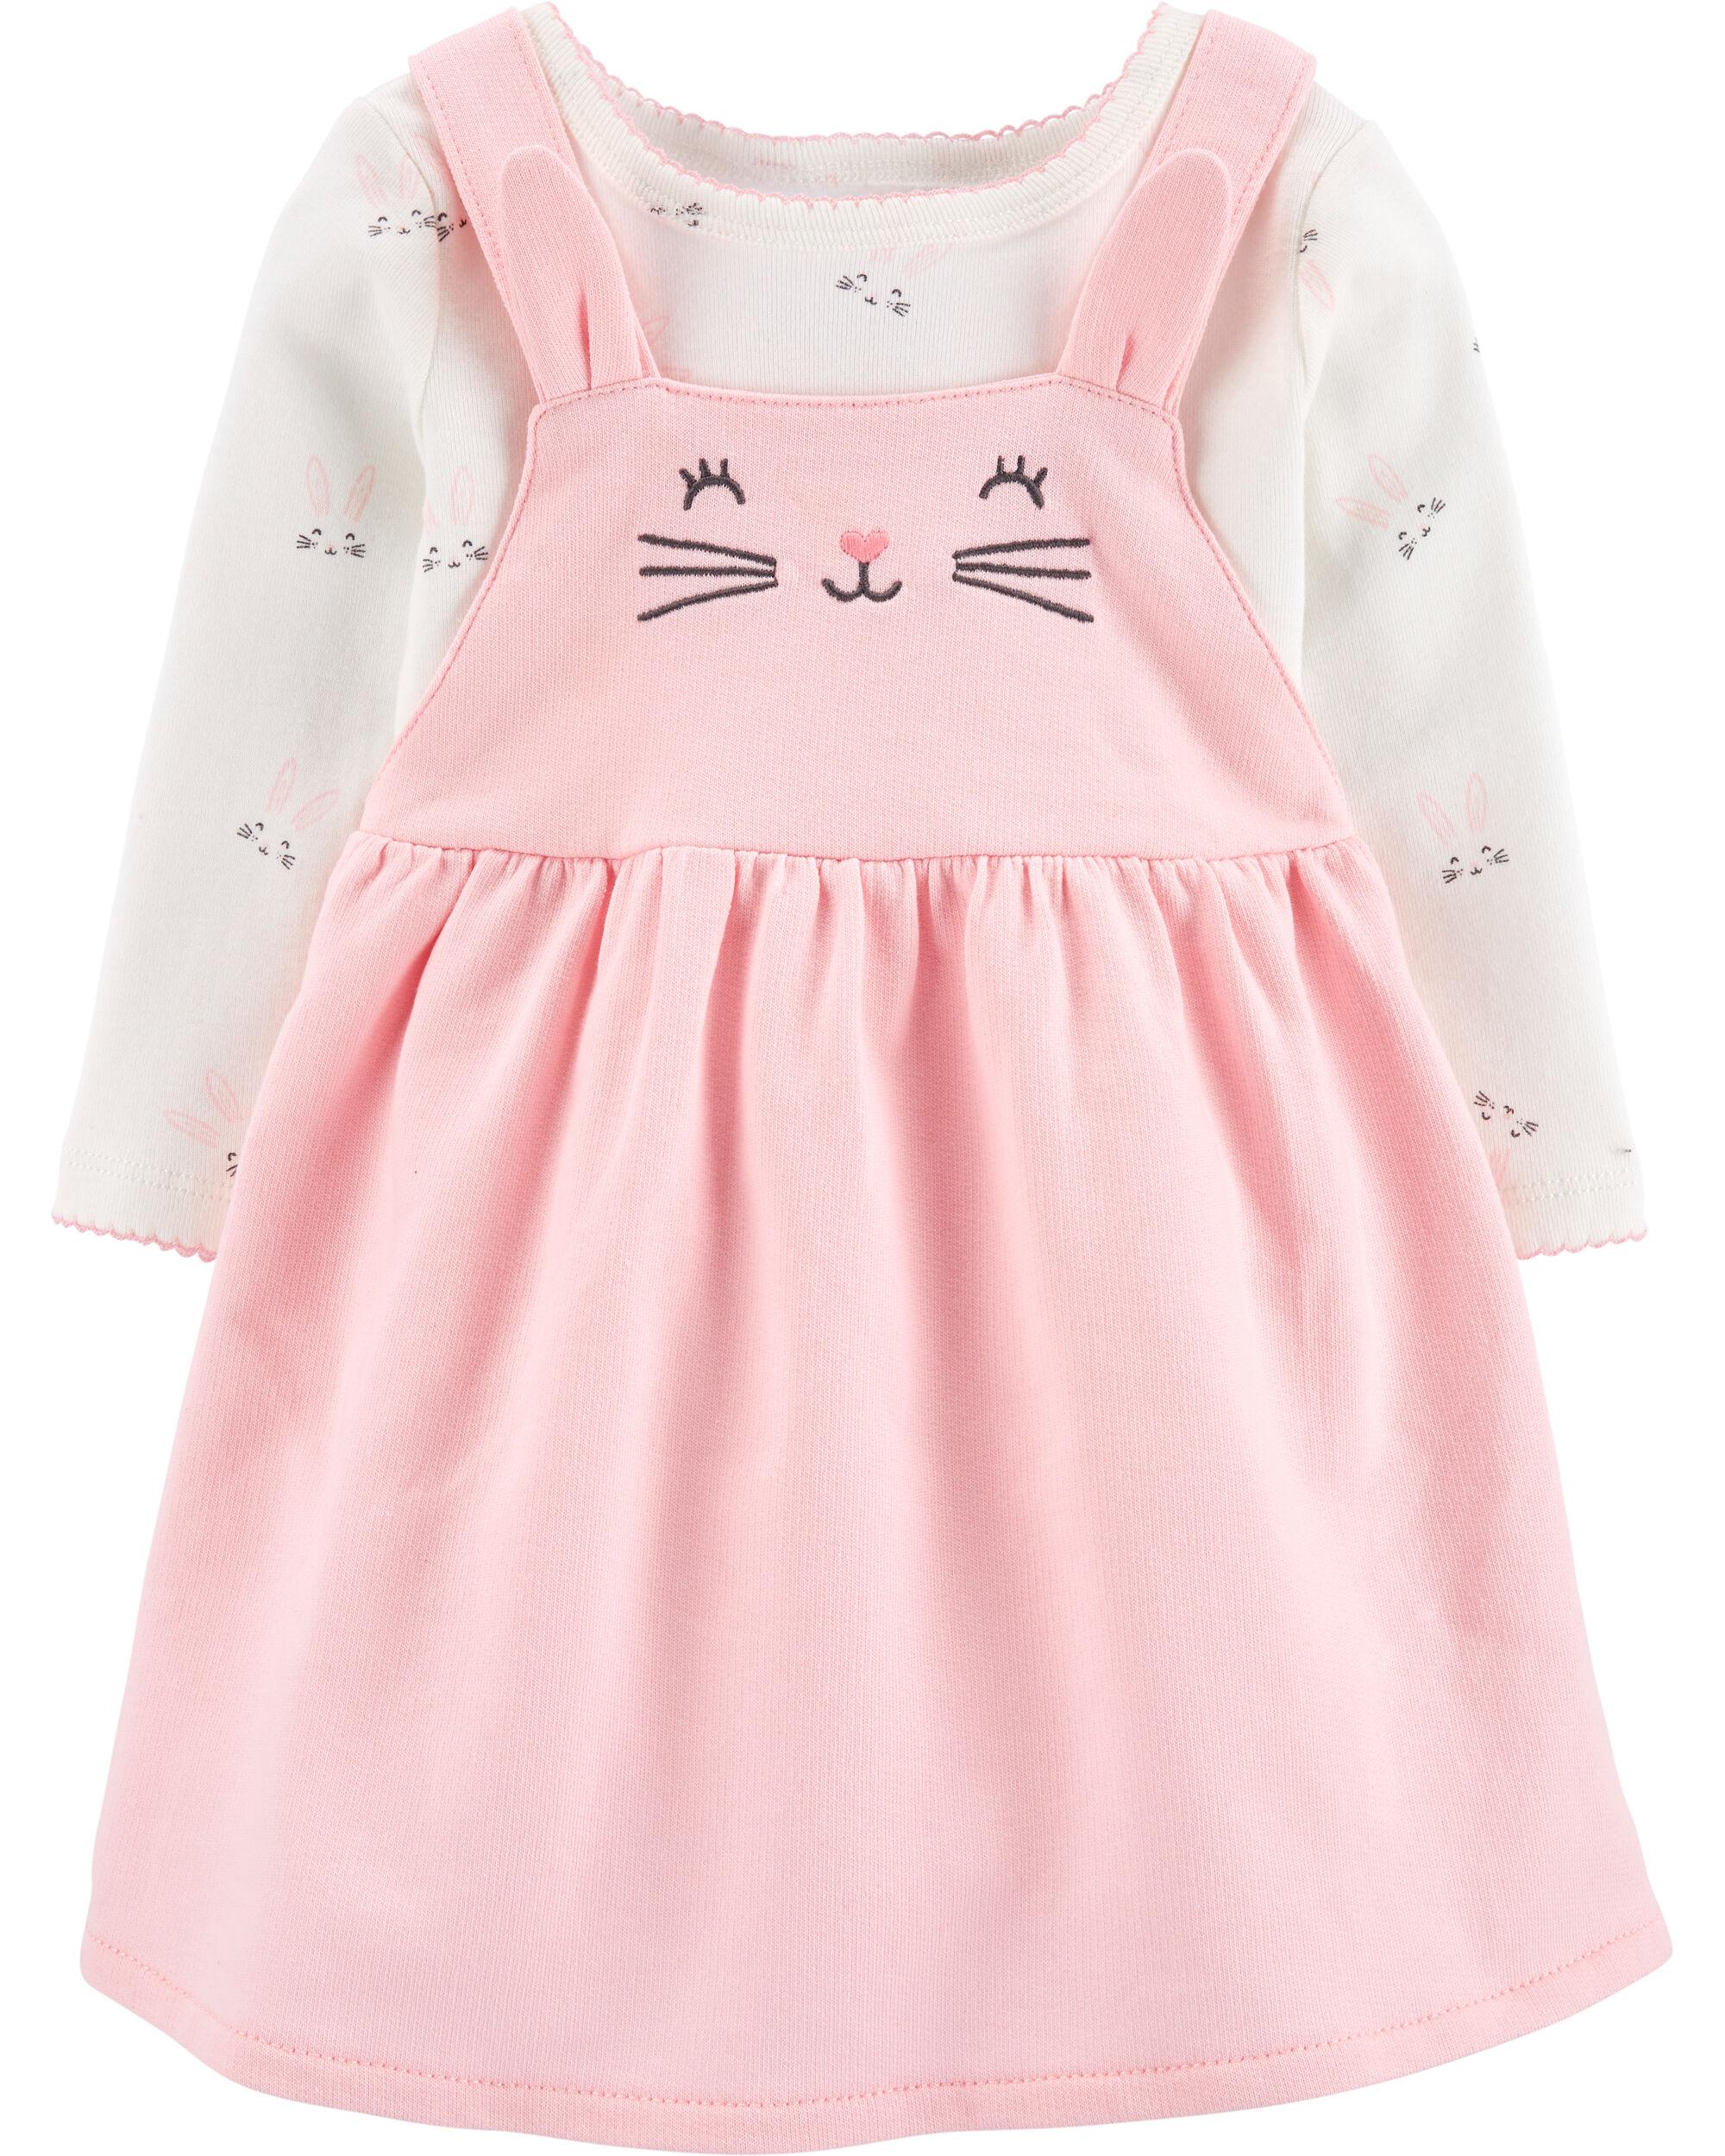 2-Piece Easter Bunny Bodysuit & Skirtall Set